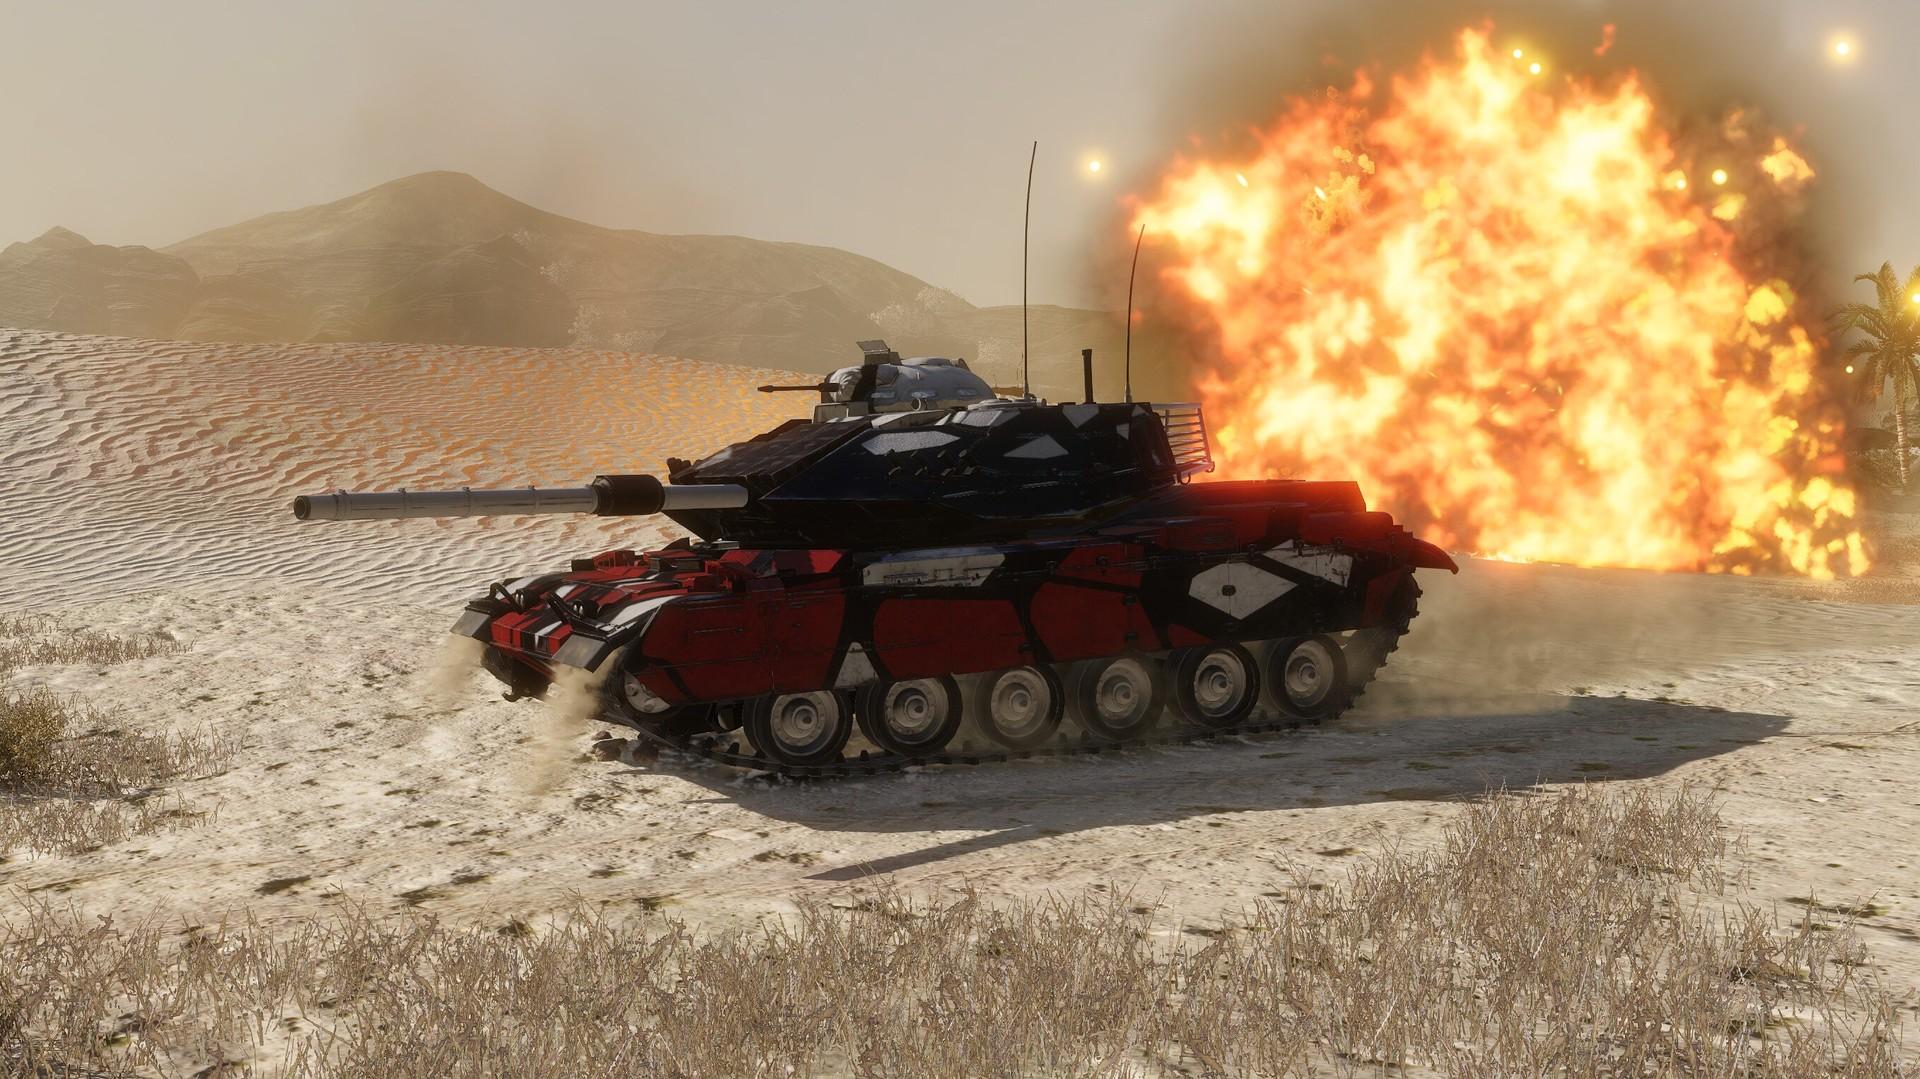 Armored warfare release date in Melbourne